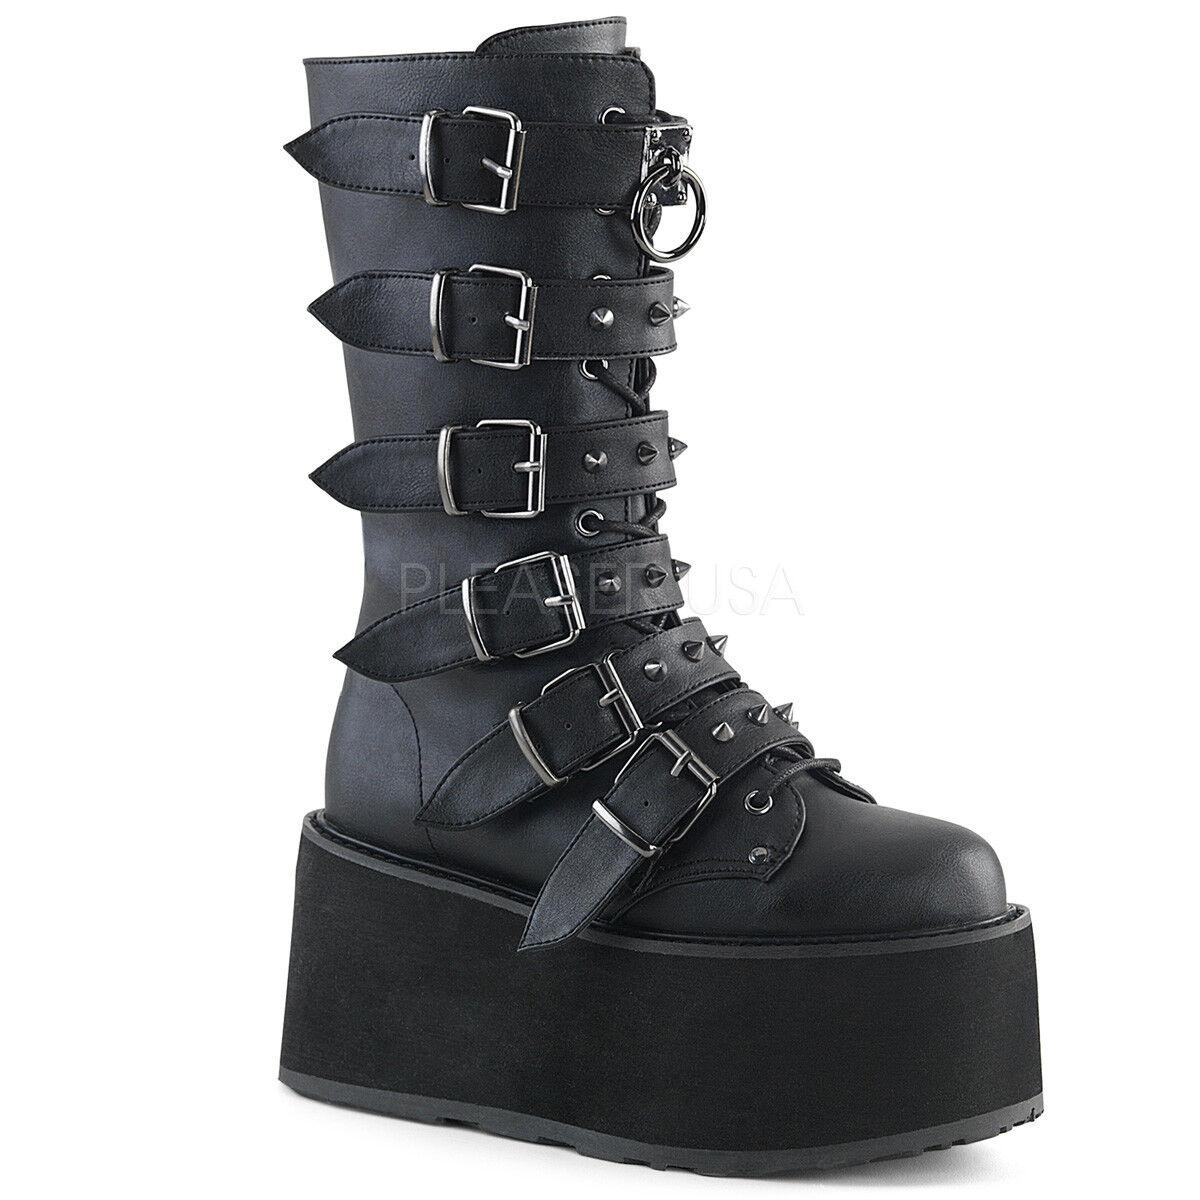 Demonia 3.5  Platform Damned Matte Black Buckle Buckle Buckle Boots 6 7 8 9 10 11 12 0132c0